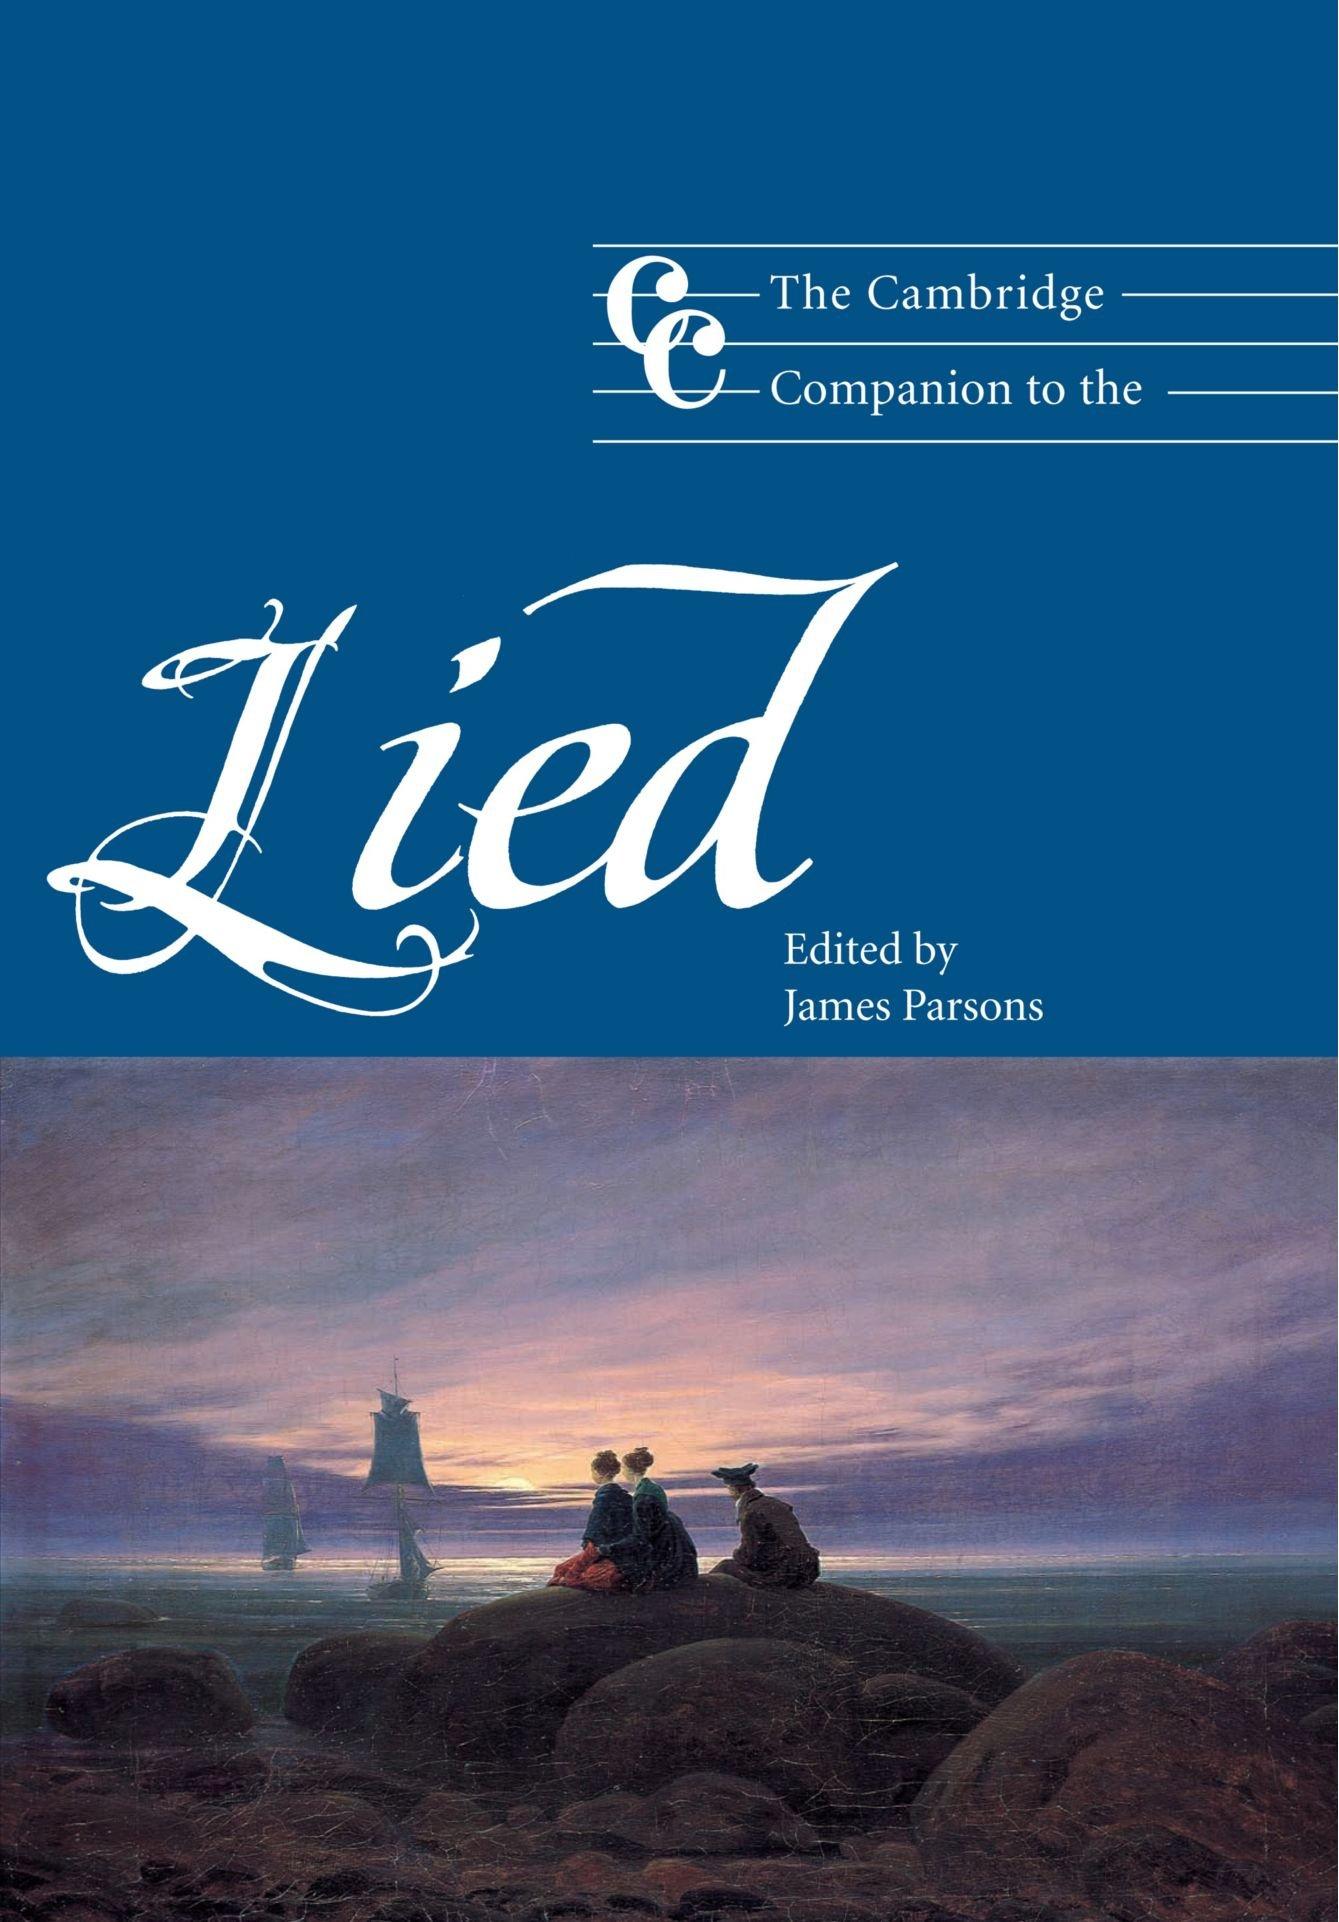 The Cambridge Companion to the Lied (Cambridge Companions to Music): James  Parsons: 9780521804714: Amazon.com: Books